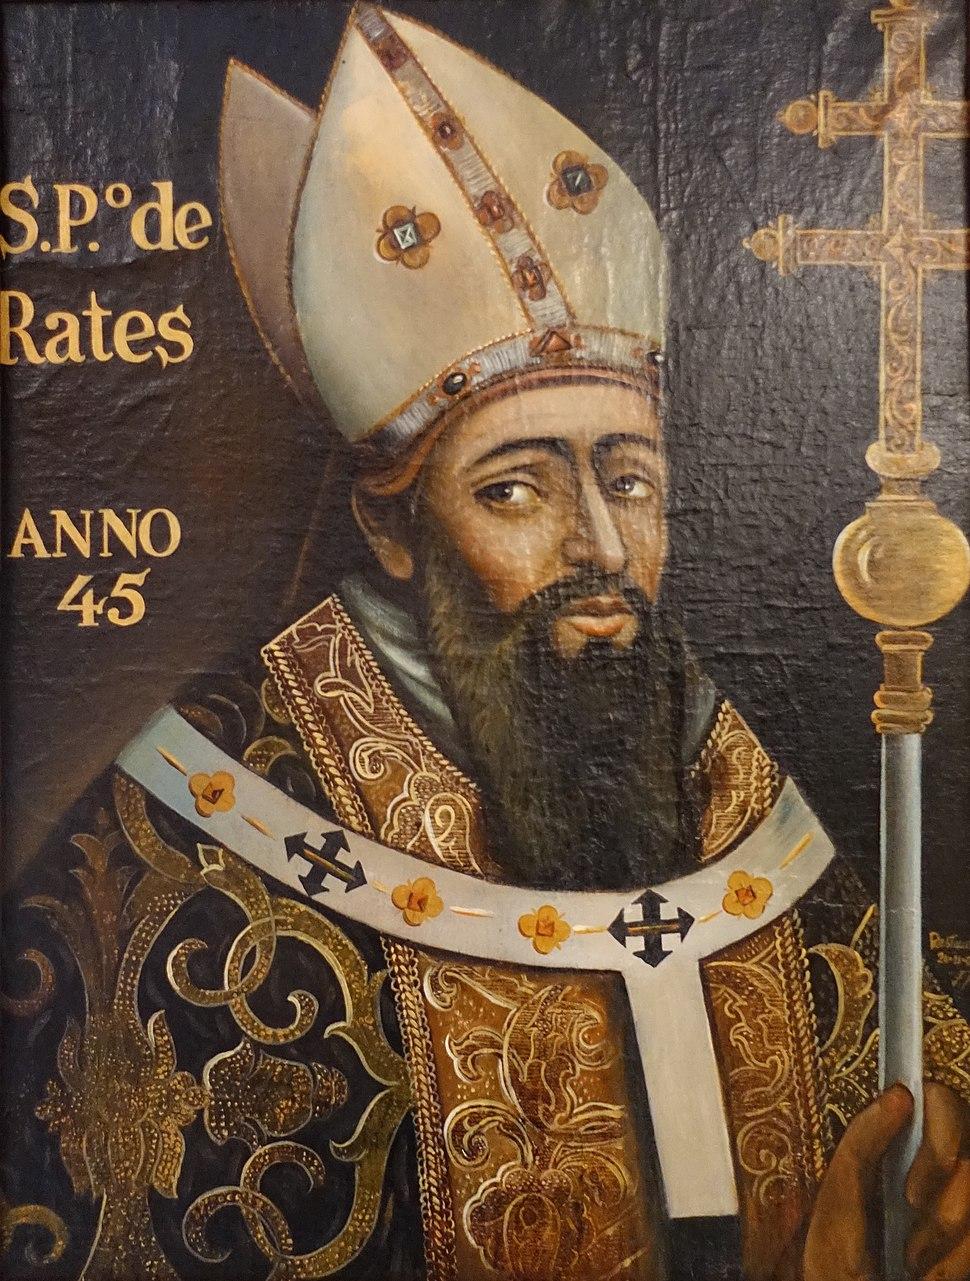 Galeria dos Arcebispos de Braga-S. P.º de Rates (cropped)